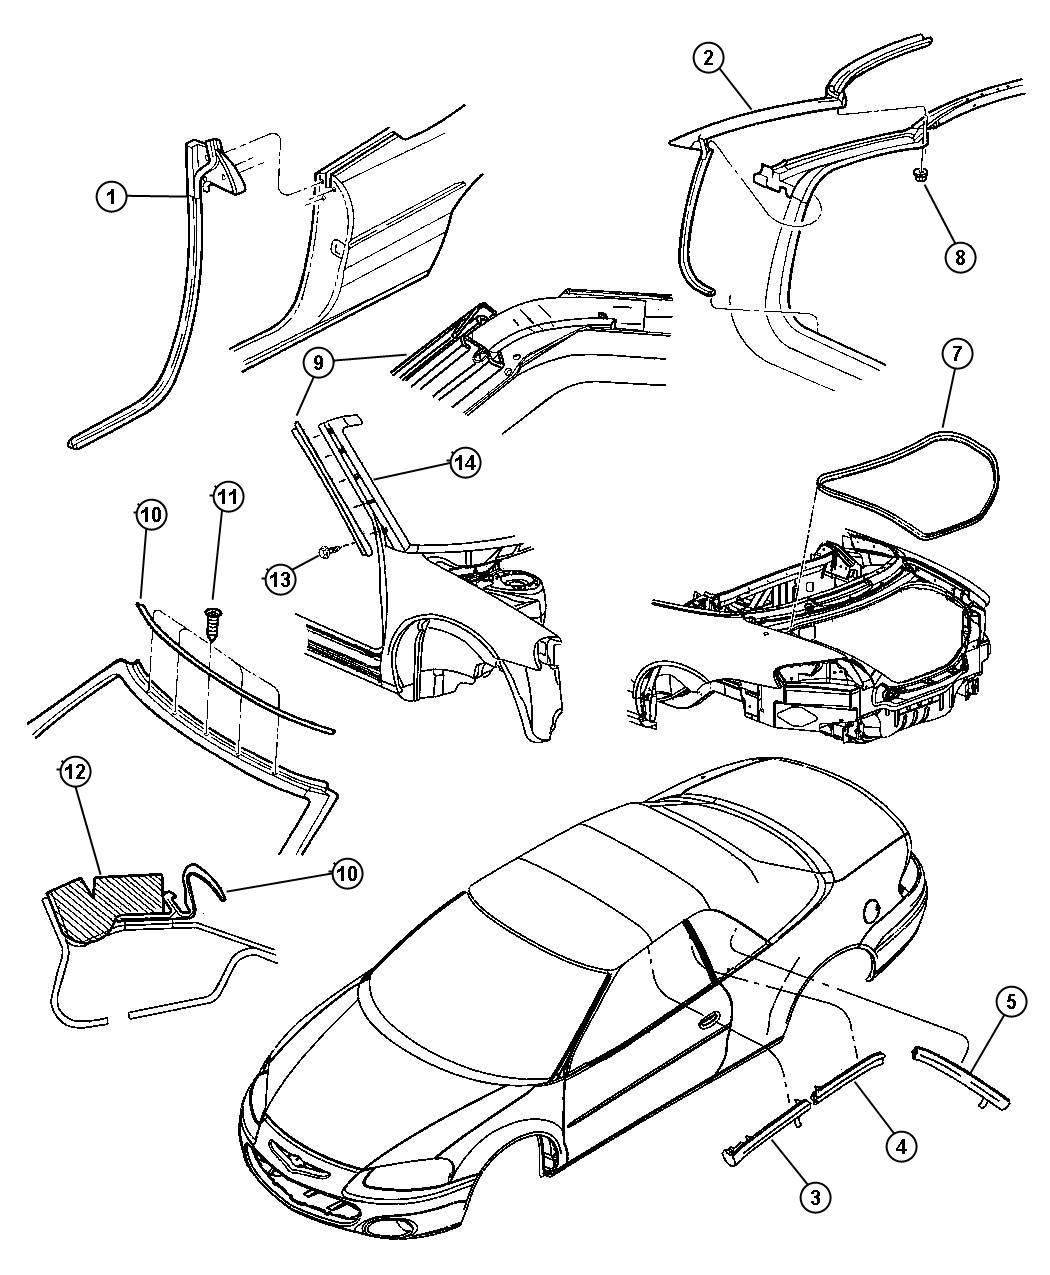 Dodge Ram Screw Tapping 164 18x 625 Rear Body